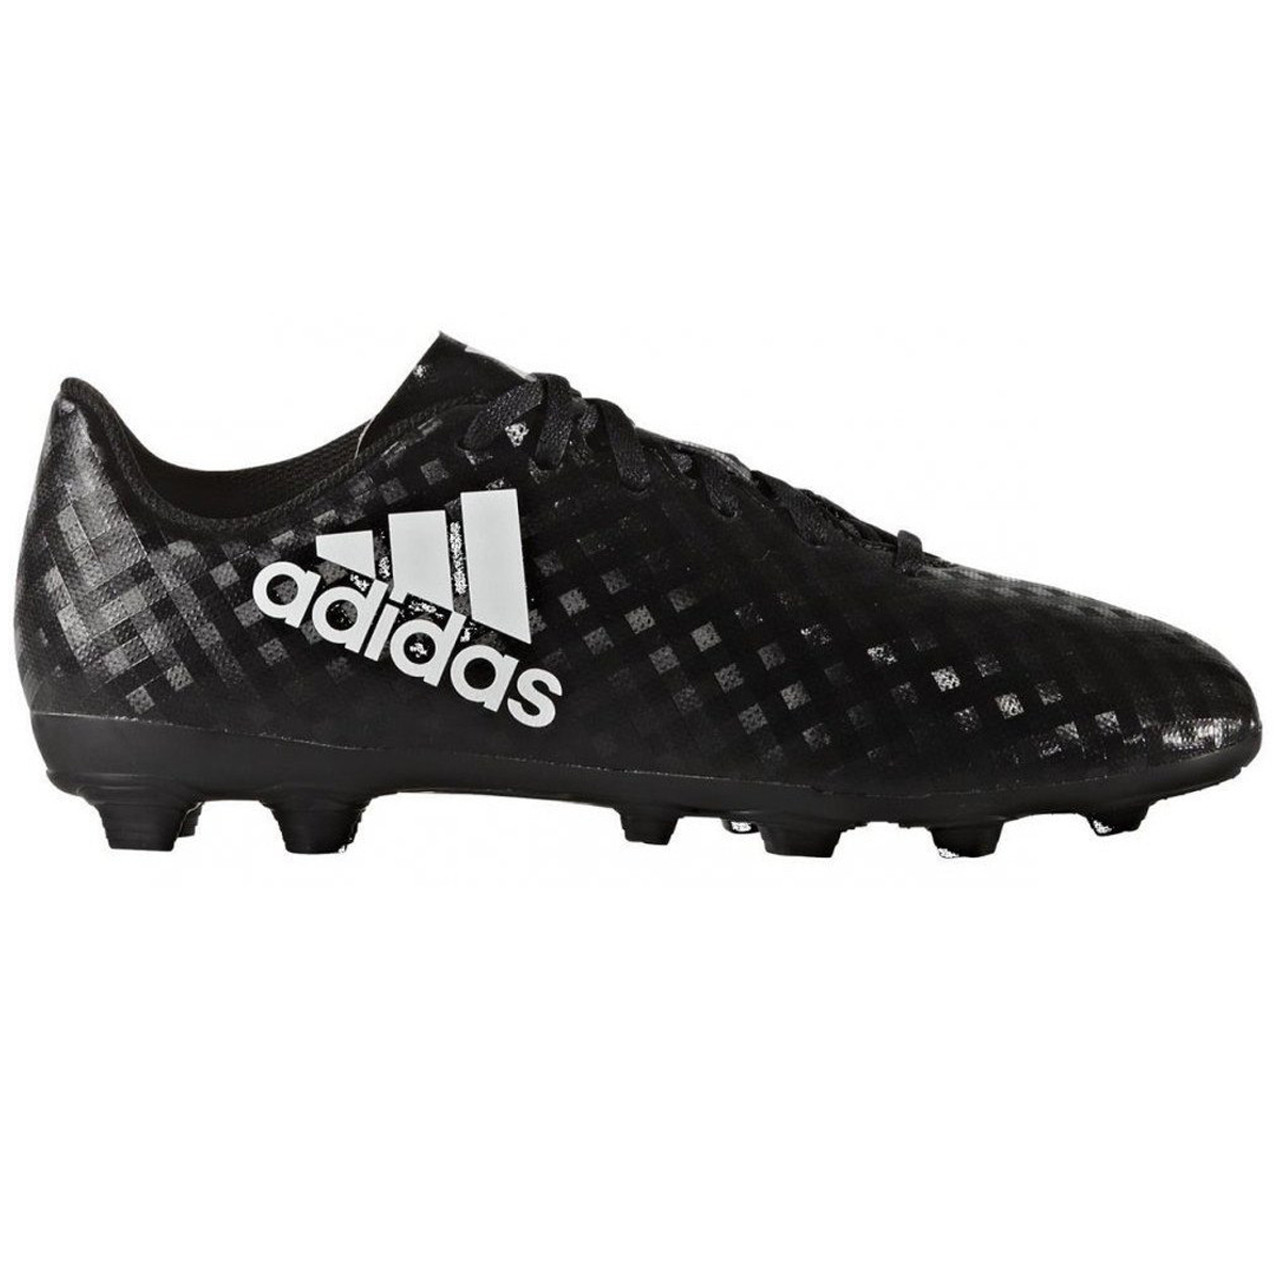 16705eeb8 Adidas X 16.4 FxG Junior Soccer Cleats BB1045 - Black White Black